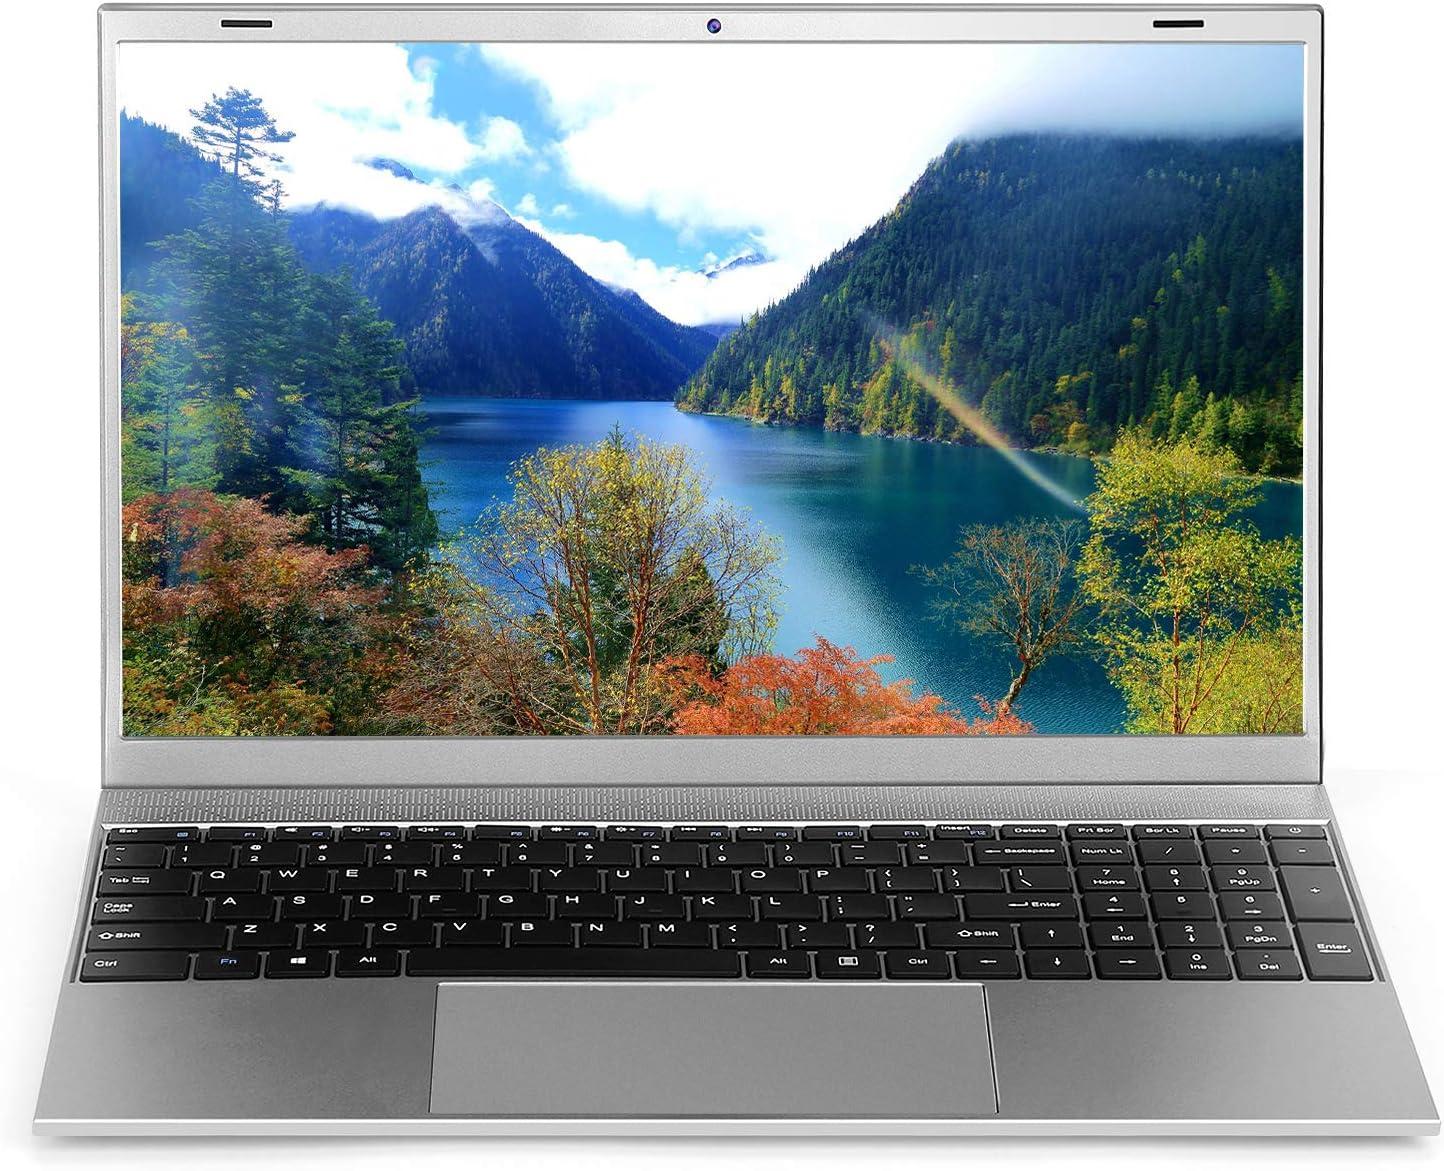 Windows Laptop Computer 15.6 inch, 8GB RAM 128GB M.2 SSD Windows 10 Pro PC Laptops, Intel Celeron J4155 Quad Core Notebook, Support 5G WiFi, Mini HDMI Webcam, Grey